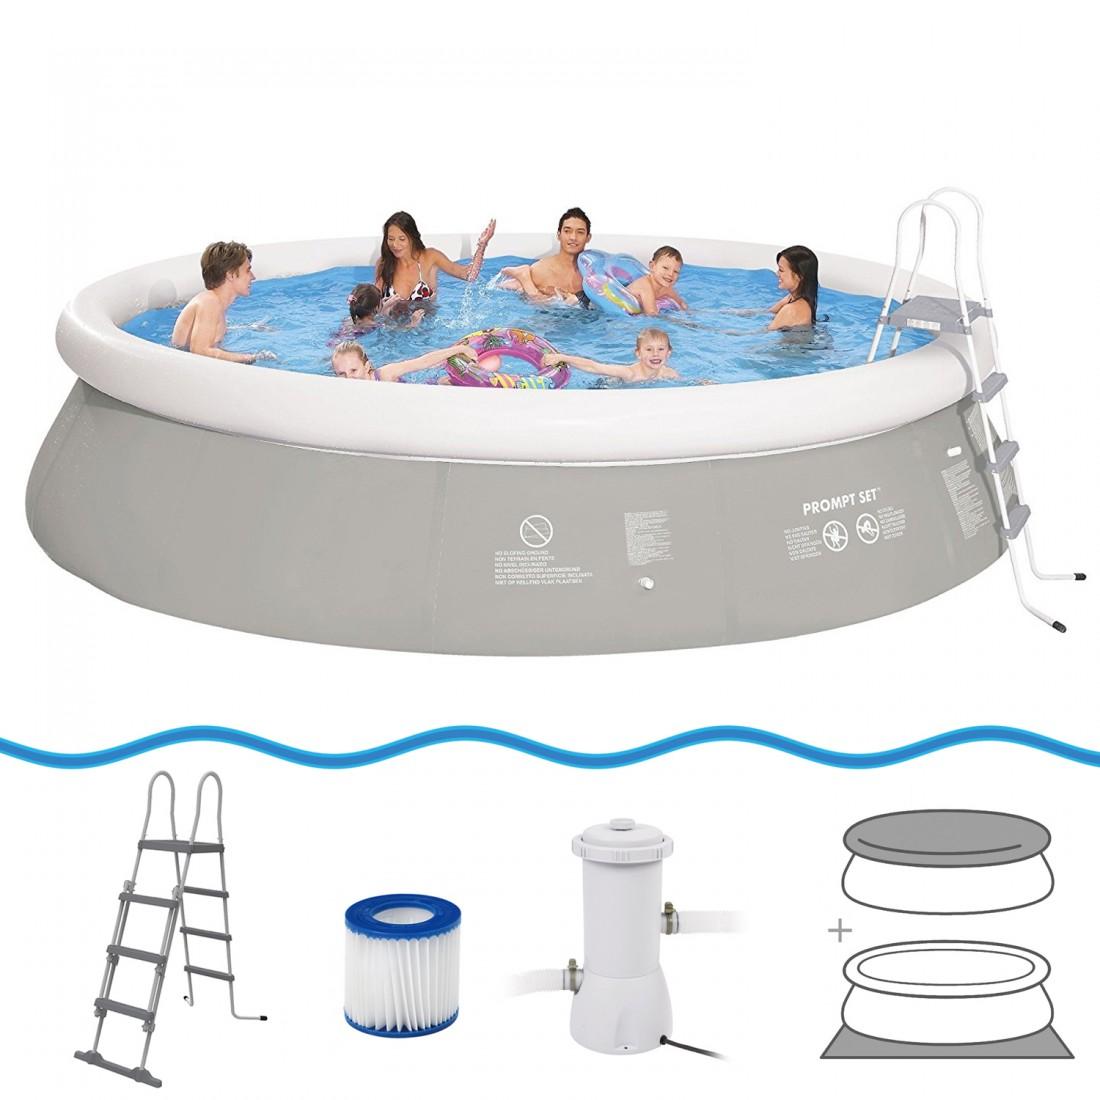 Comprare jilong prompt set pool marin grey 540h set for Comprare piscina